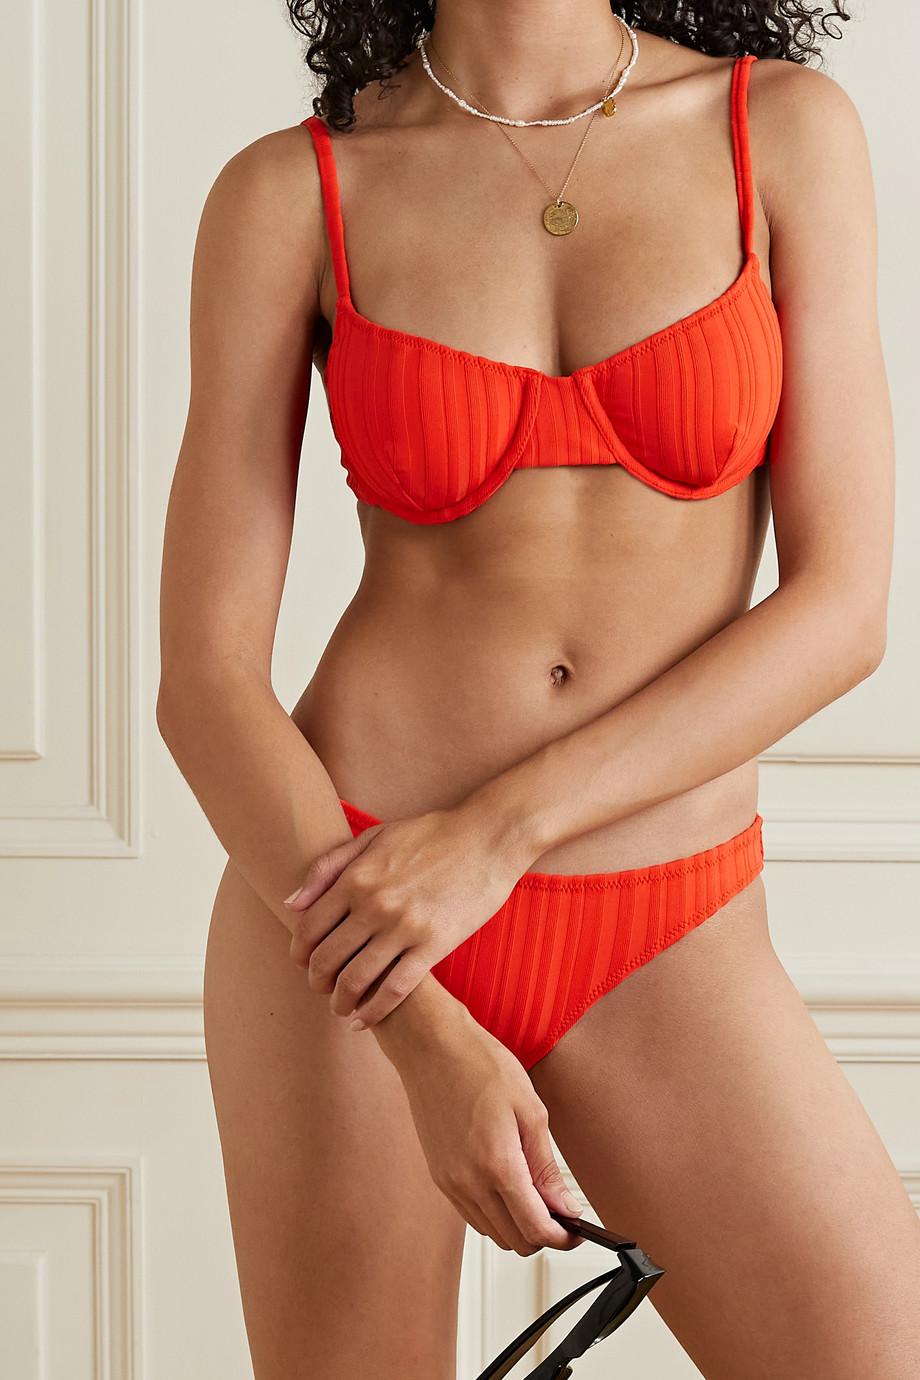 Solid & Striped The Eva geripptes Bügel-Bikini-Oberteil